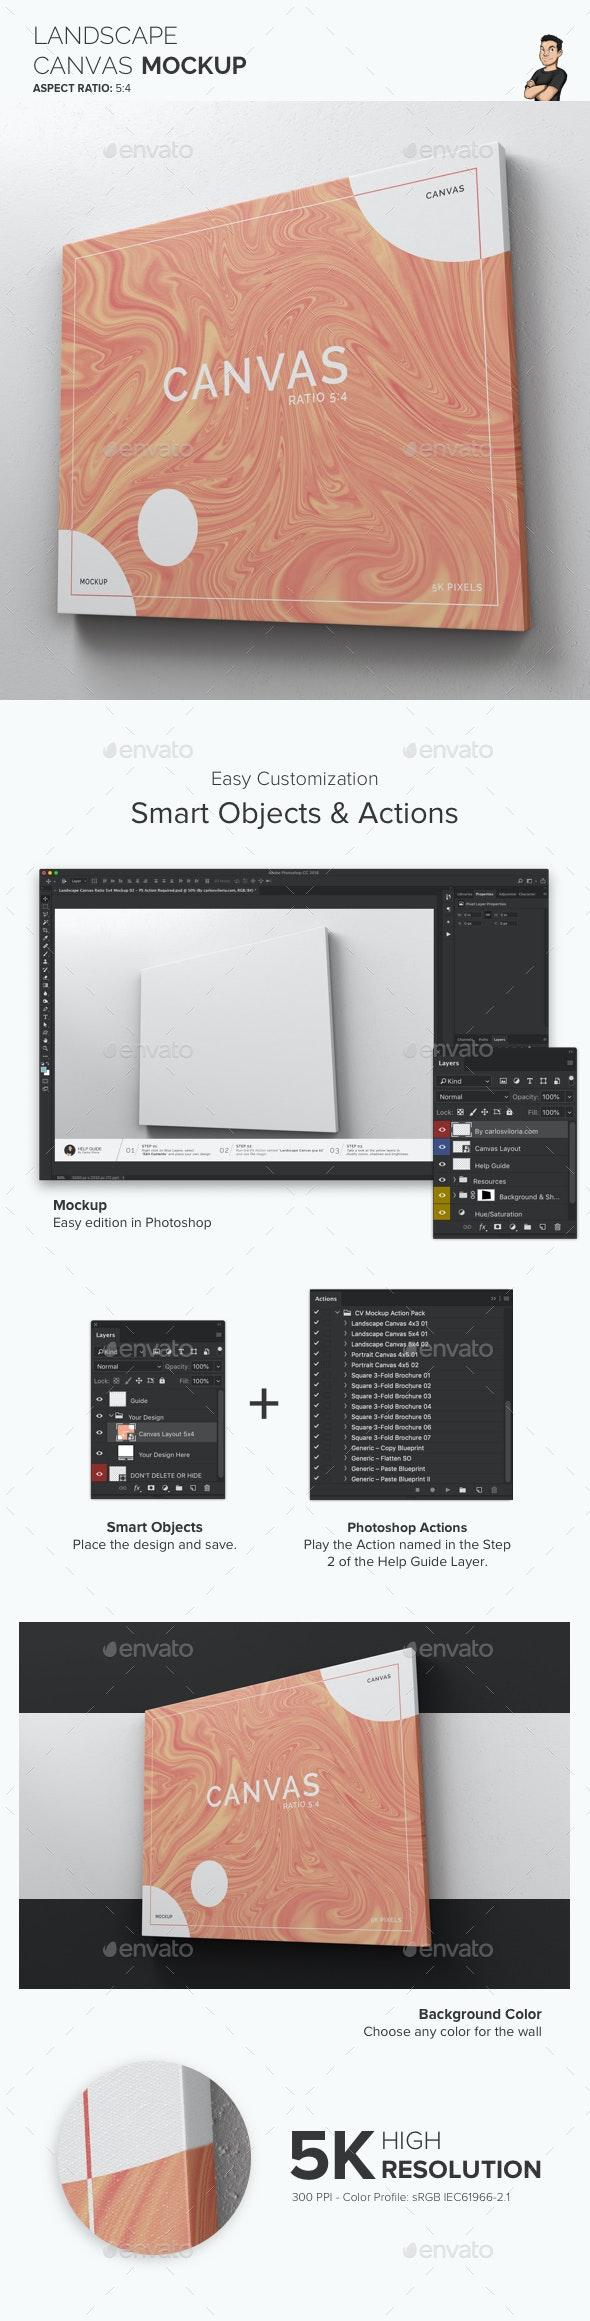 Landscape Canvas Ratio 5x4 Mockup 02 - Print Product Mock-Ups